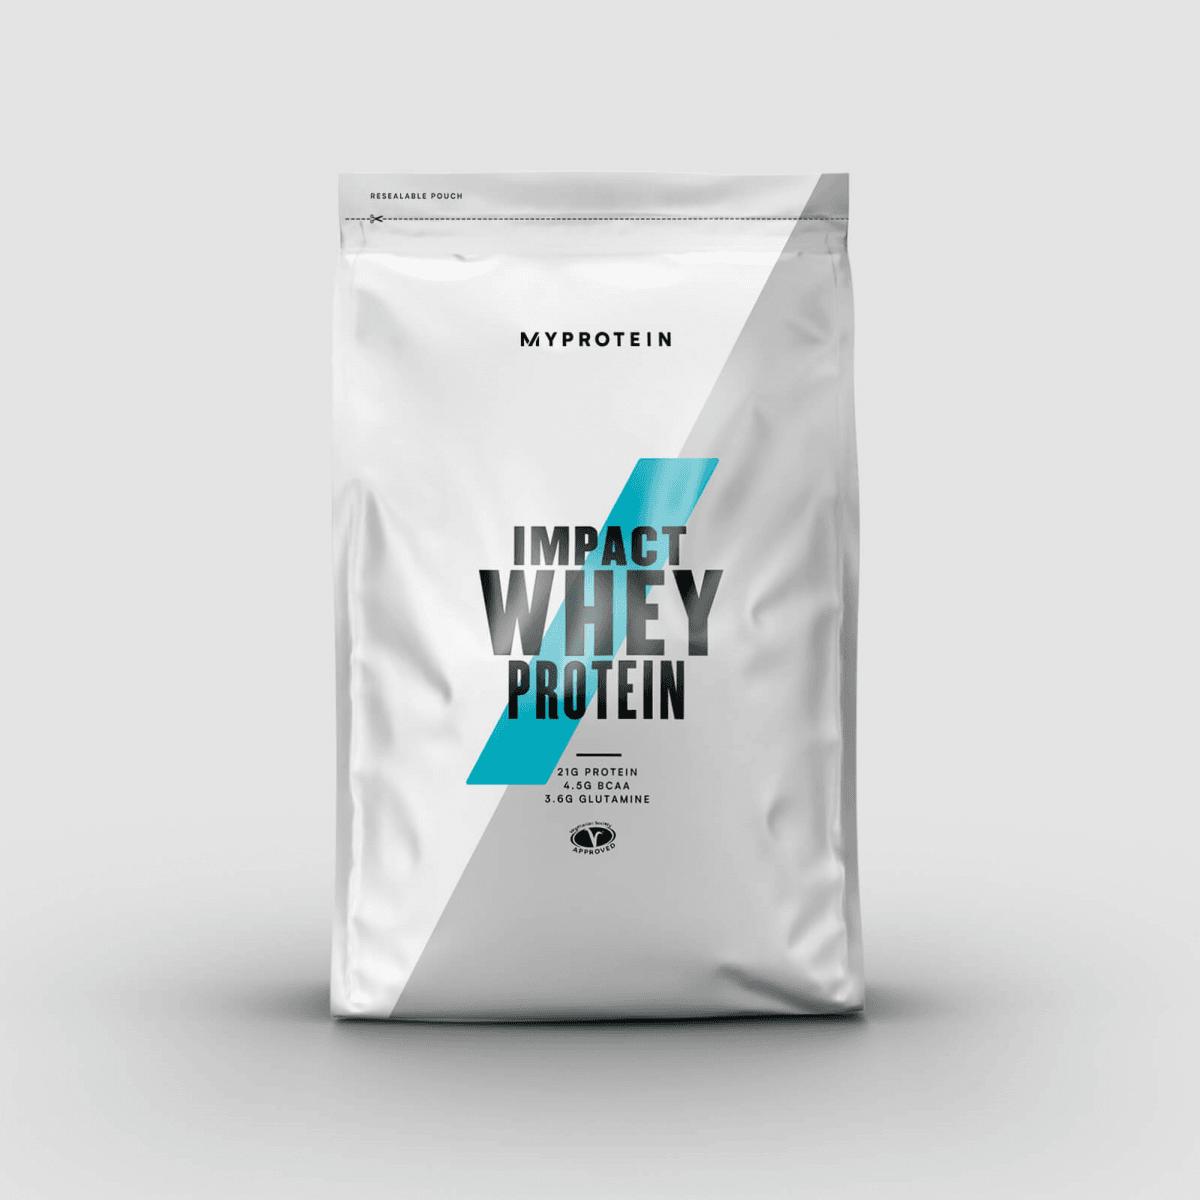 【Myprotein】 濃縮乳清 乳清蛋白 2.5kg 搖搖杯組合 1